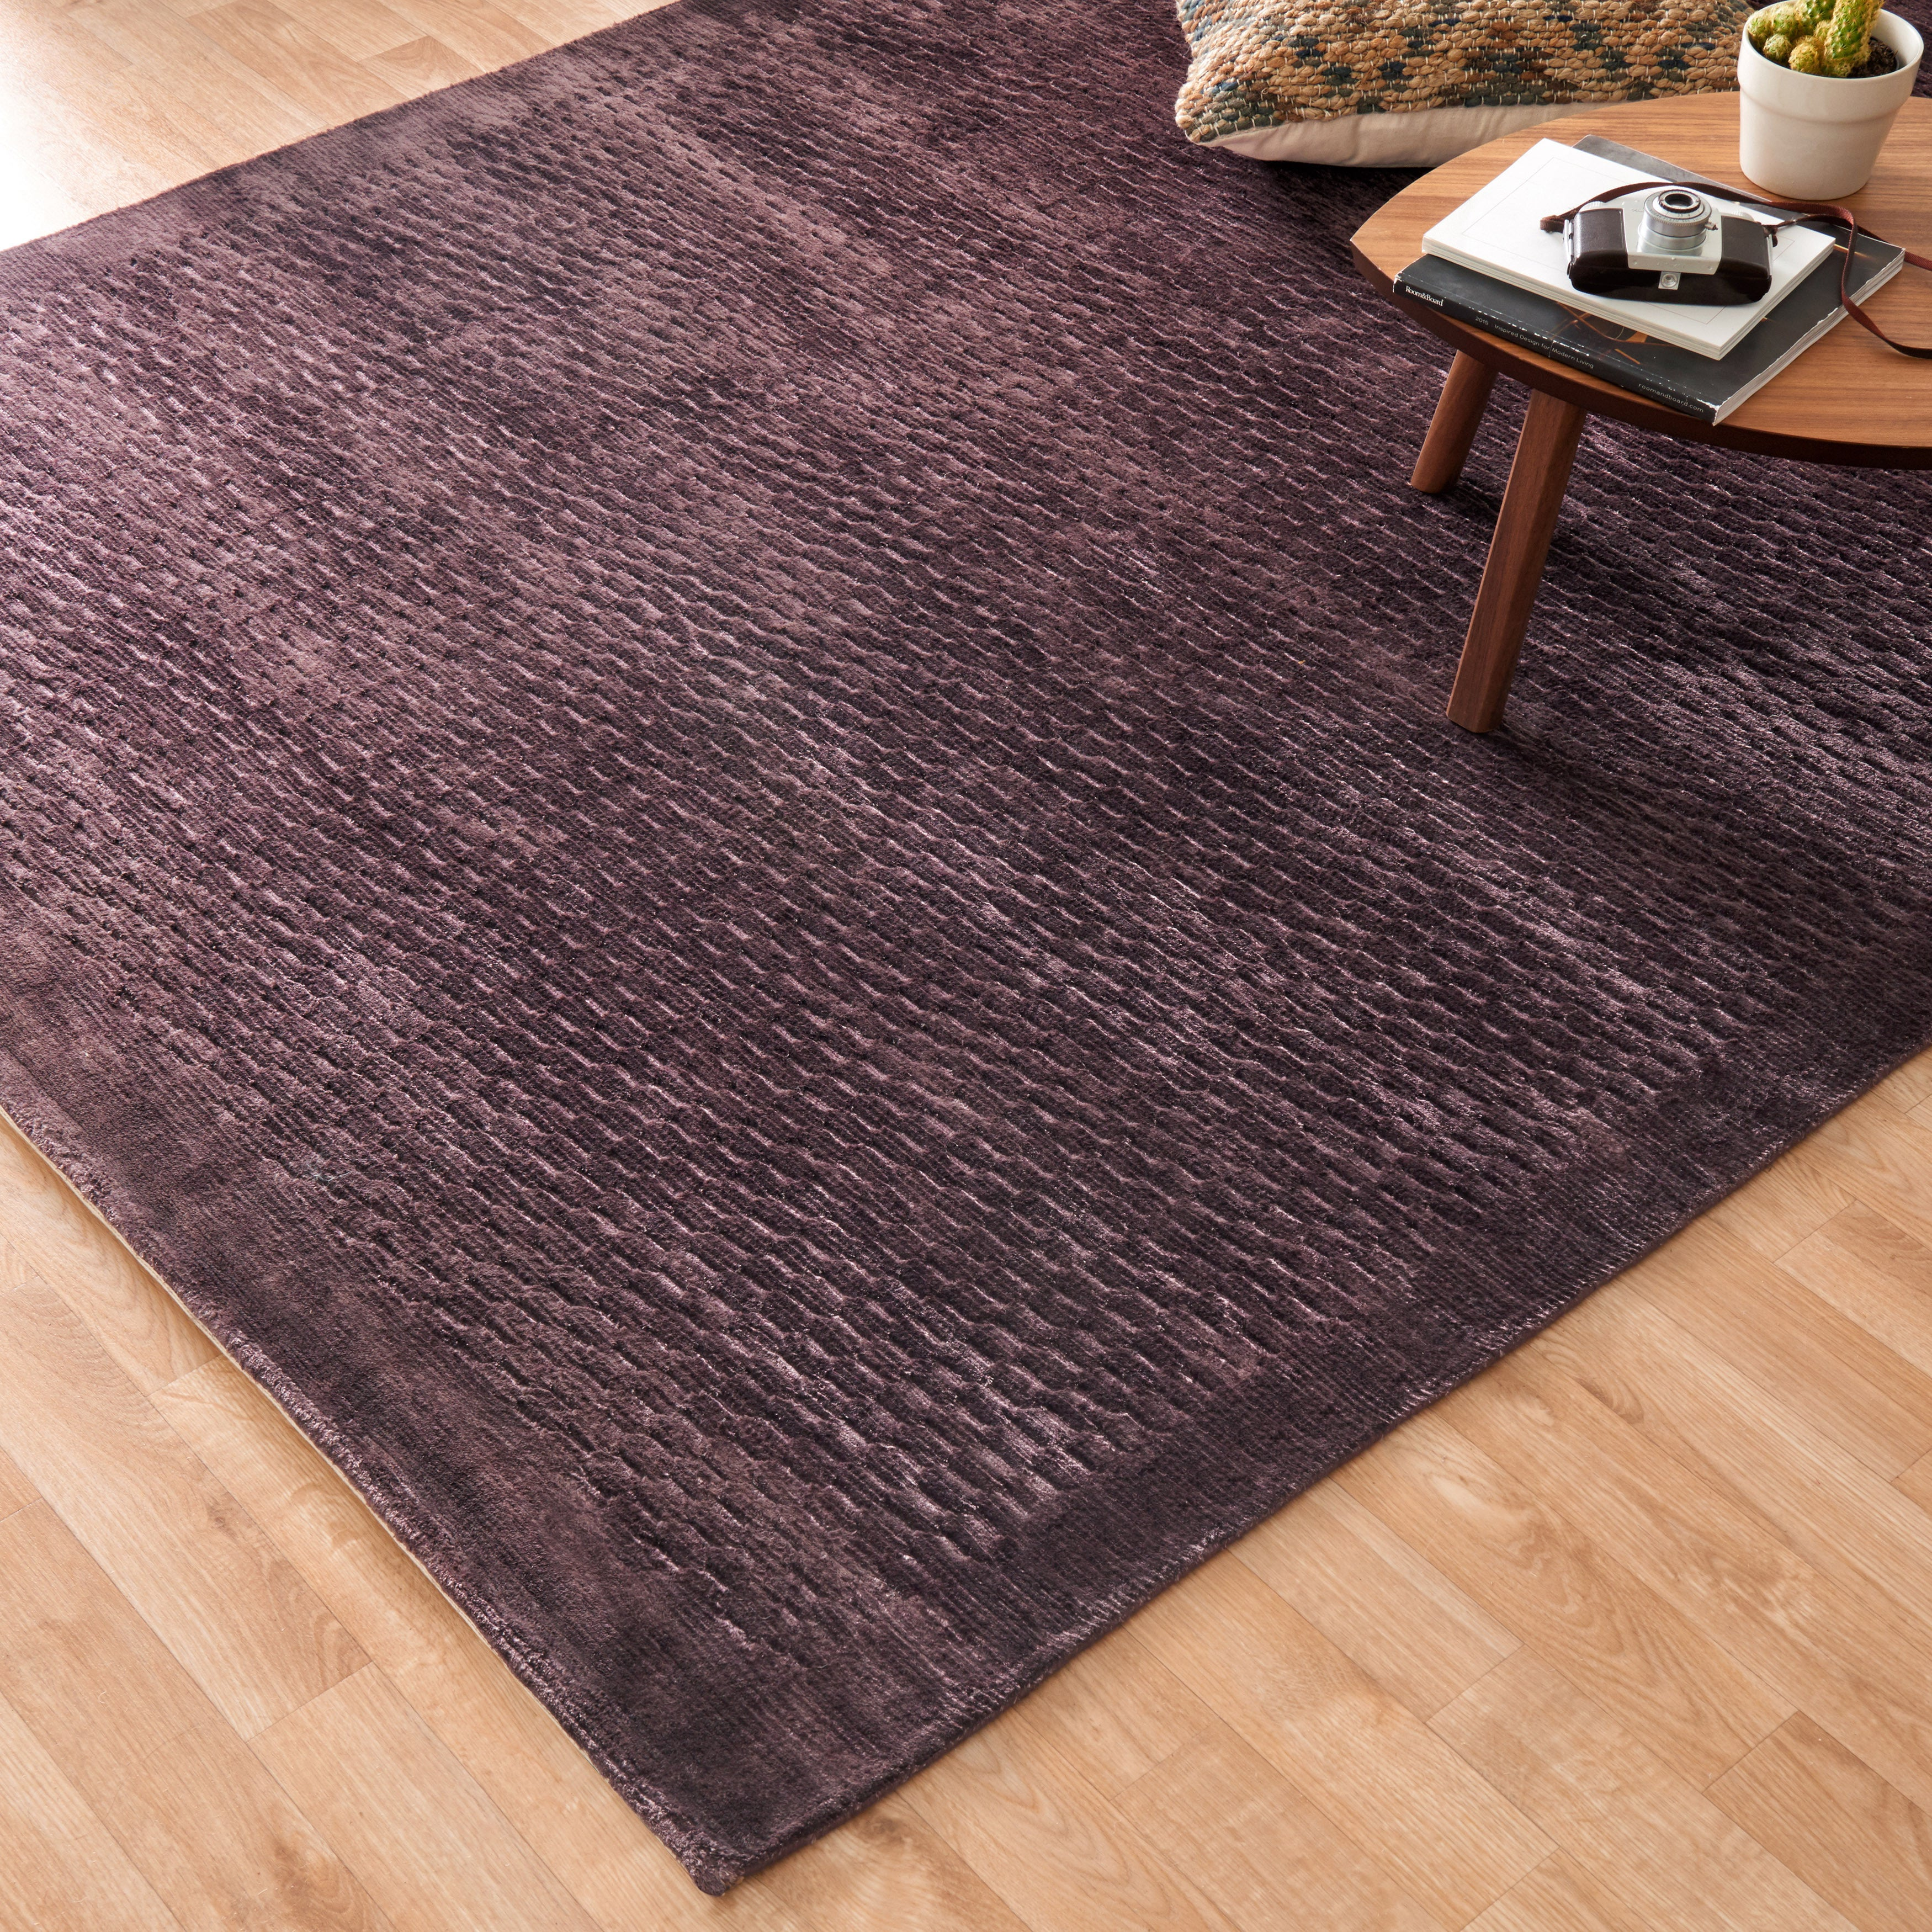 Hand-woven Grandeur Plum Viscose Rug (56 x 86) - 56 x 86 (Plum - 56 x 86)